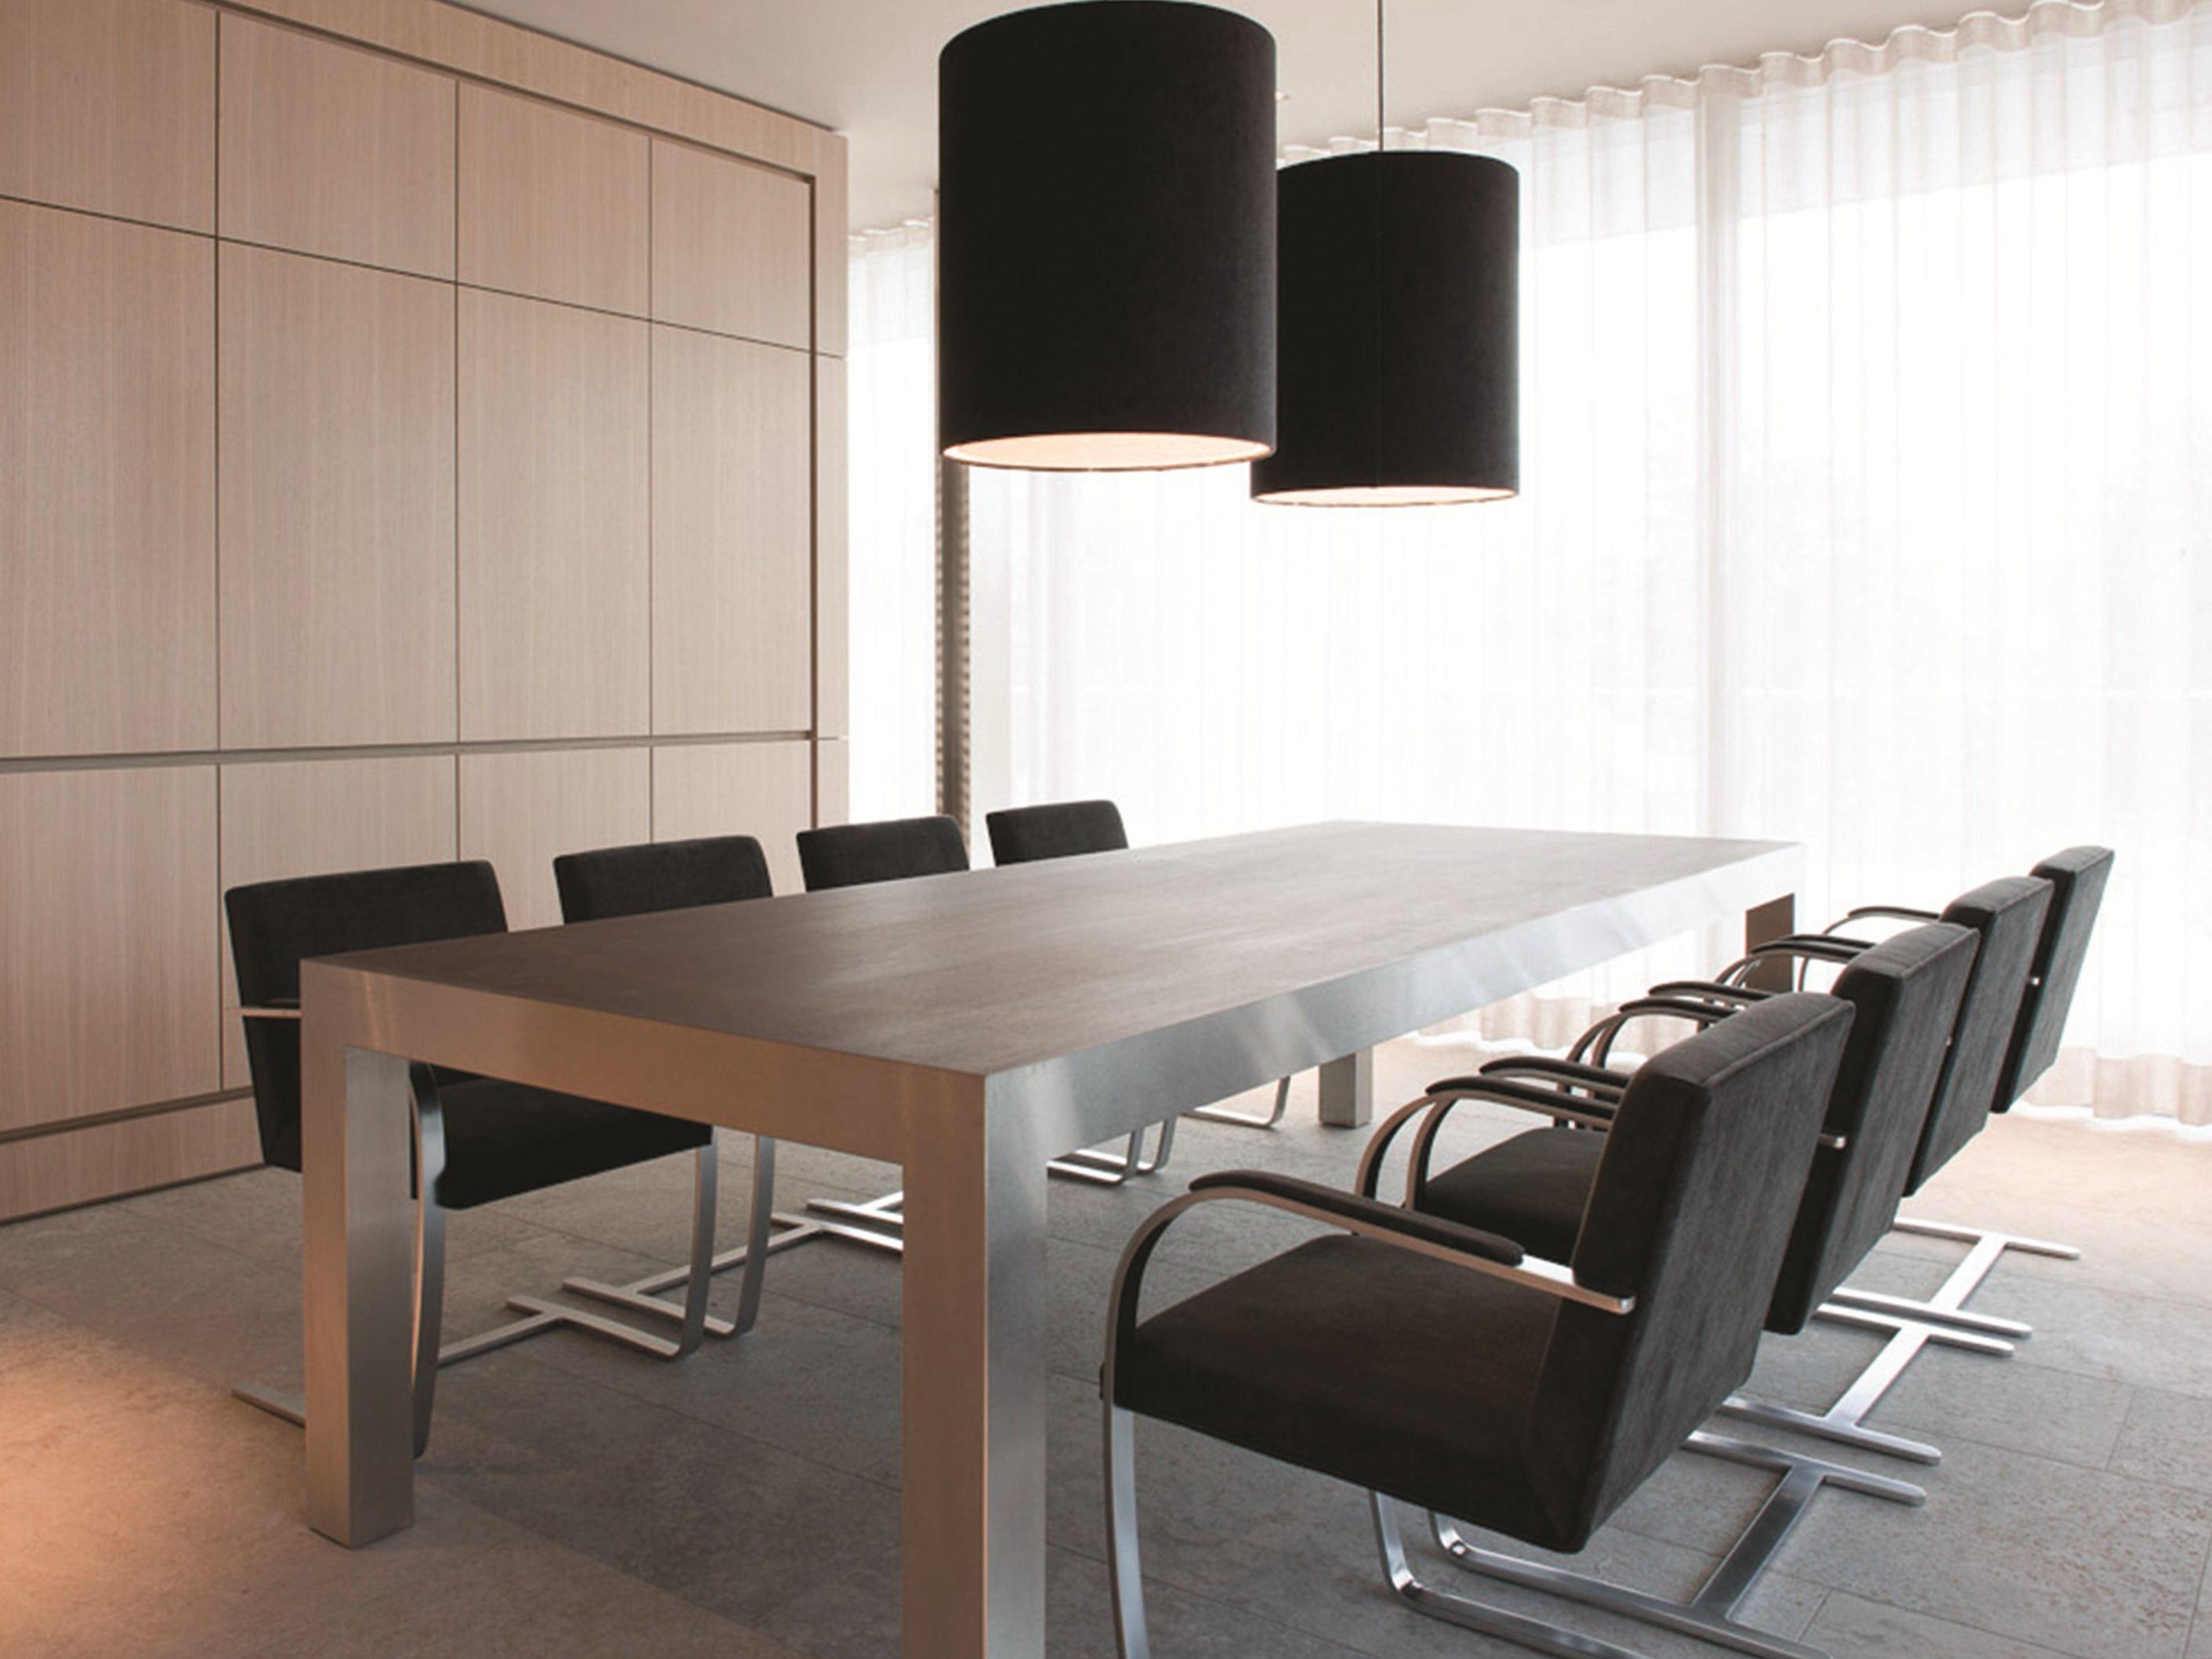 Tavoli cucine gallery of tavolo da cucina in legno - Cucine d acciaio ...